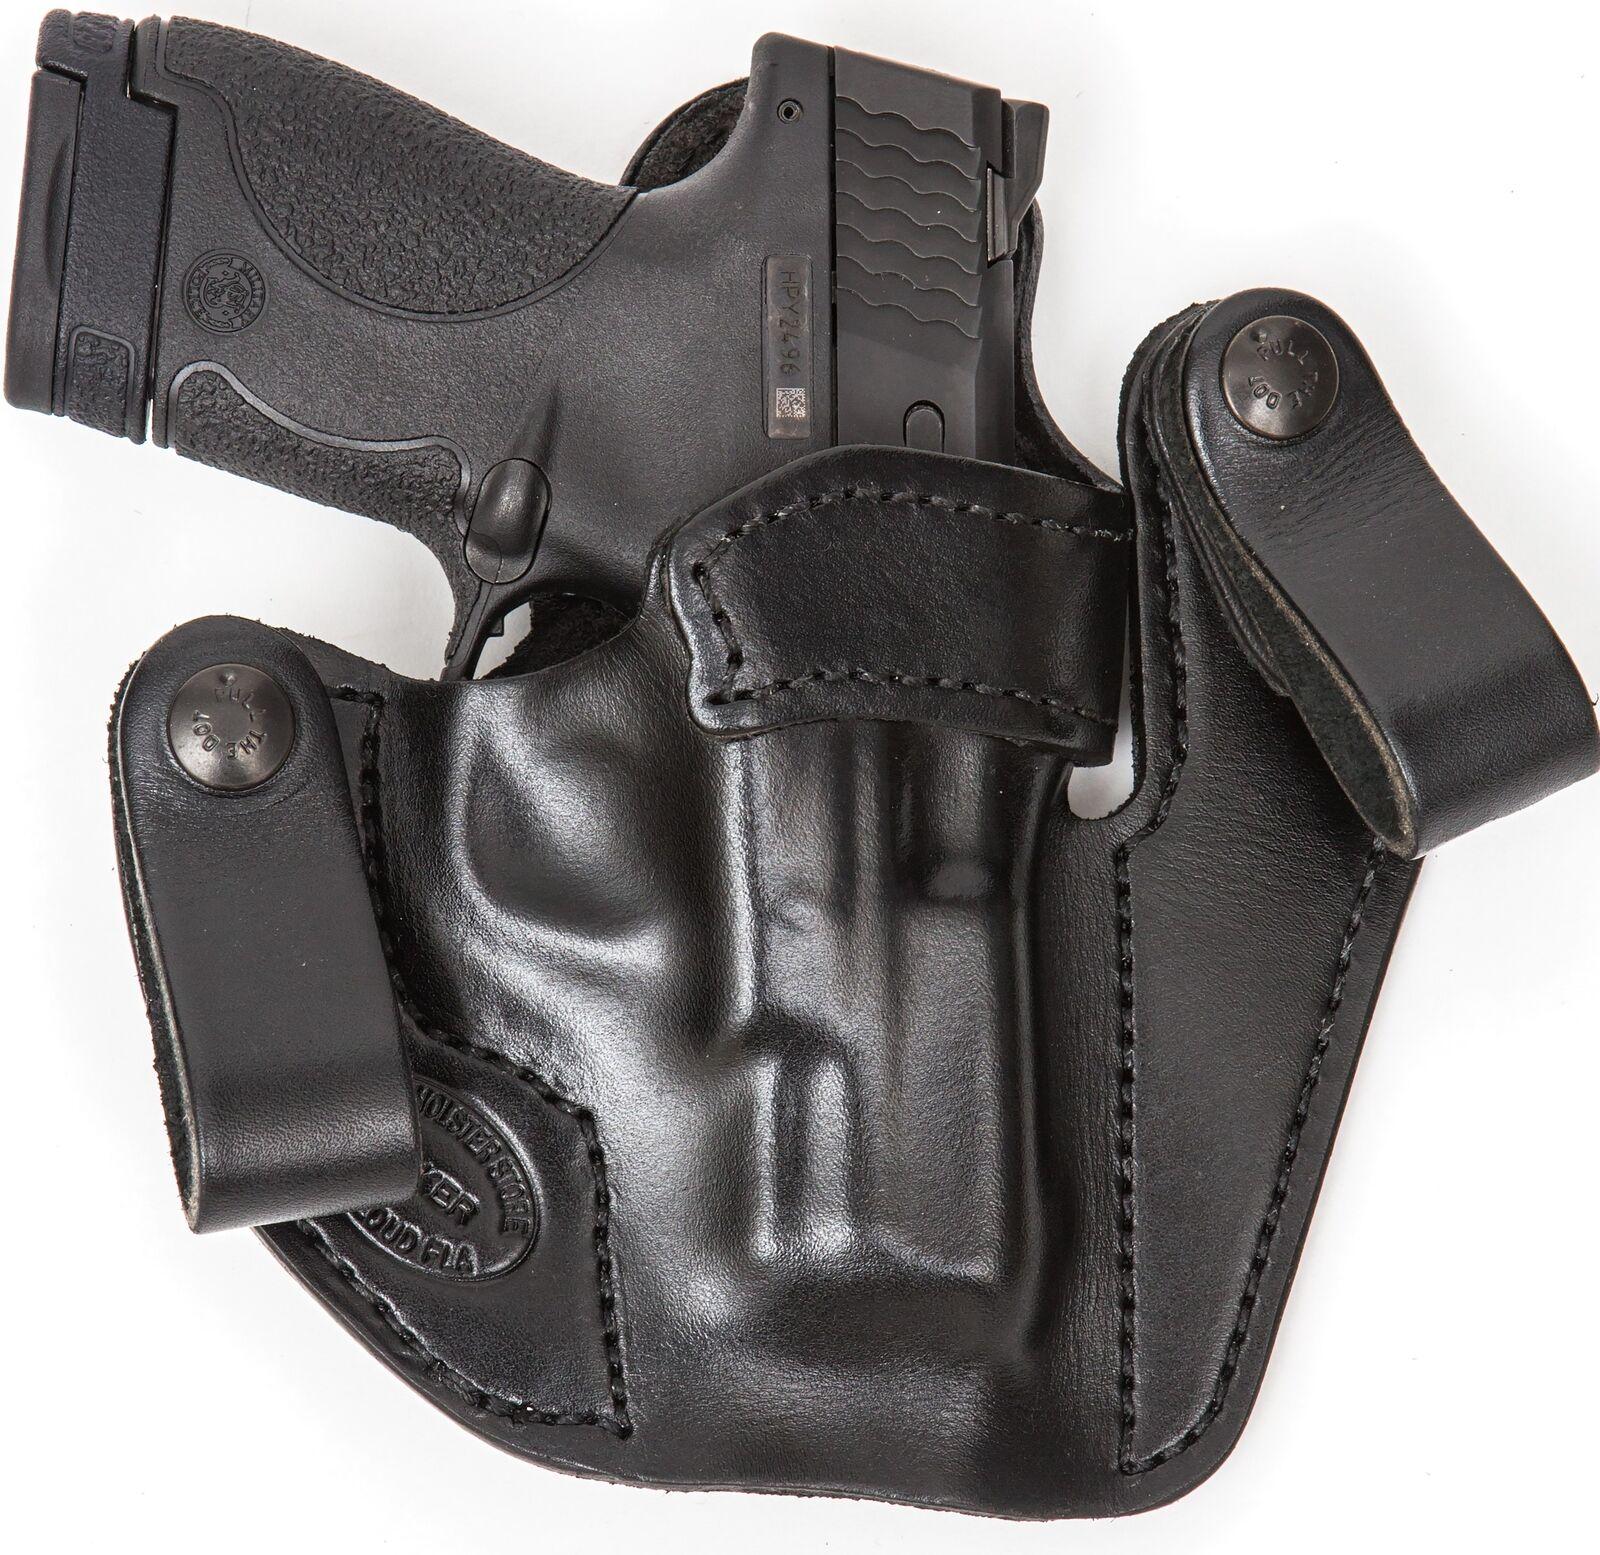 XTREME CARRY RH LH SP01 IWB Leder Gun Holster For CZ 75 SP01 LH w/ Rails c3b381